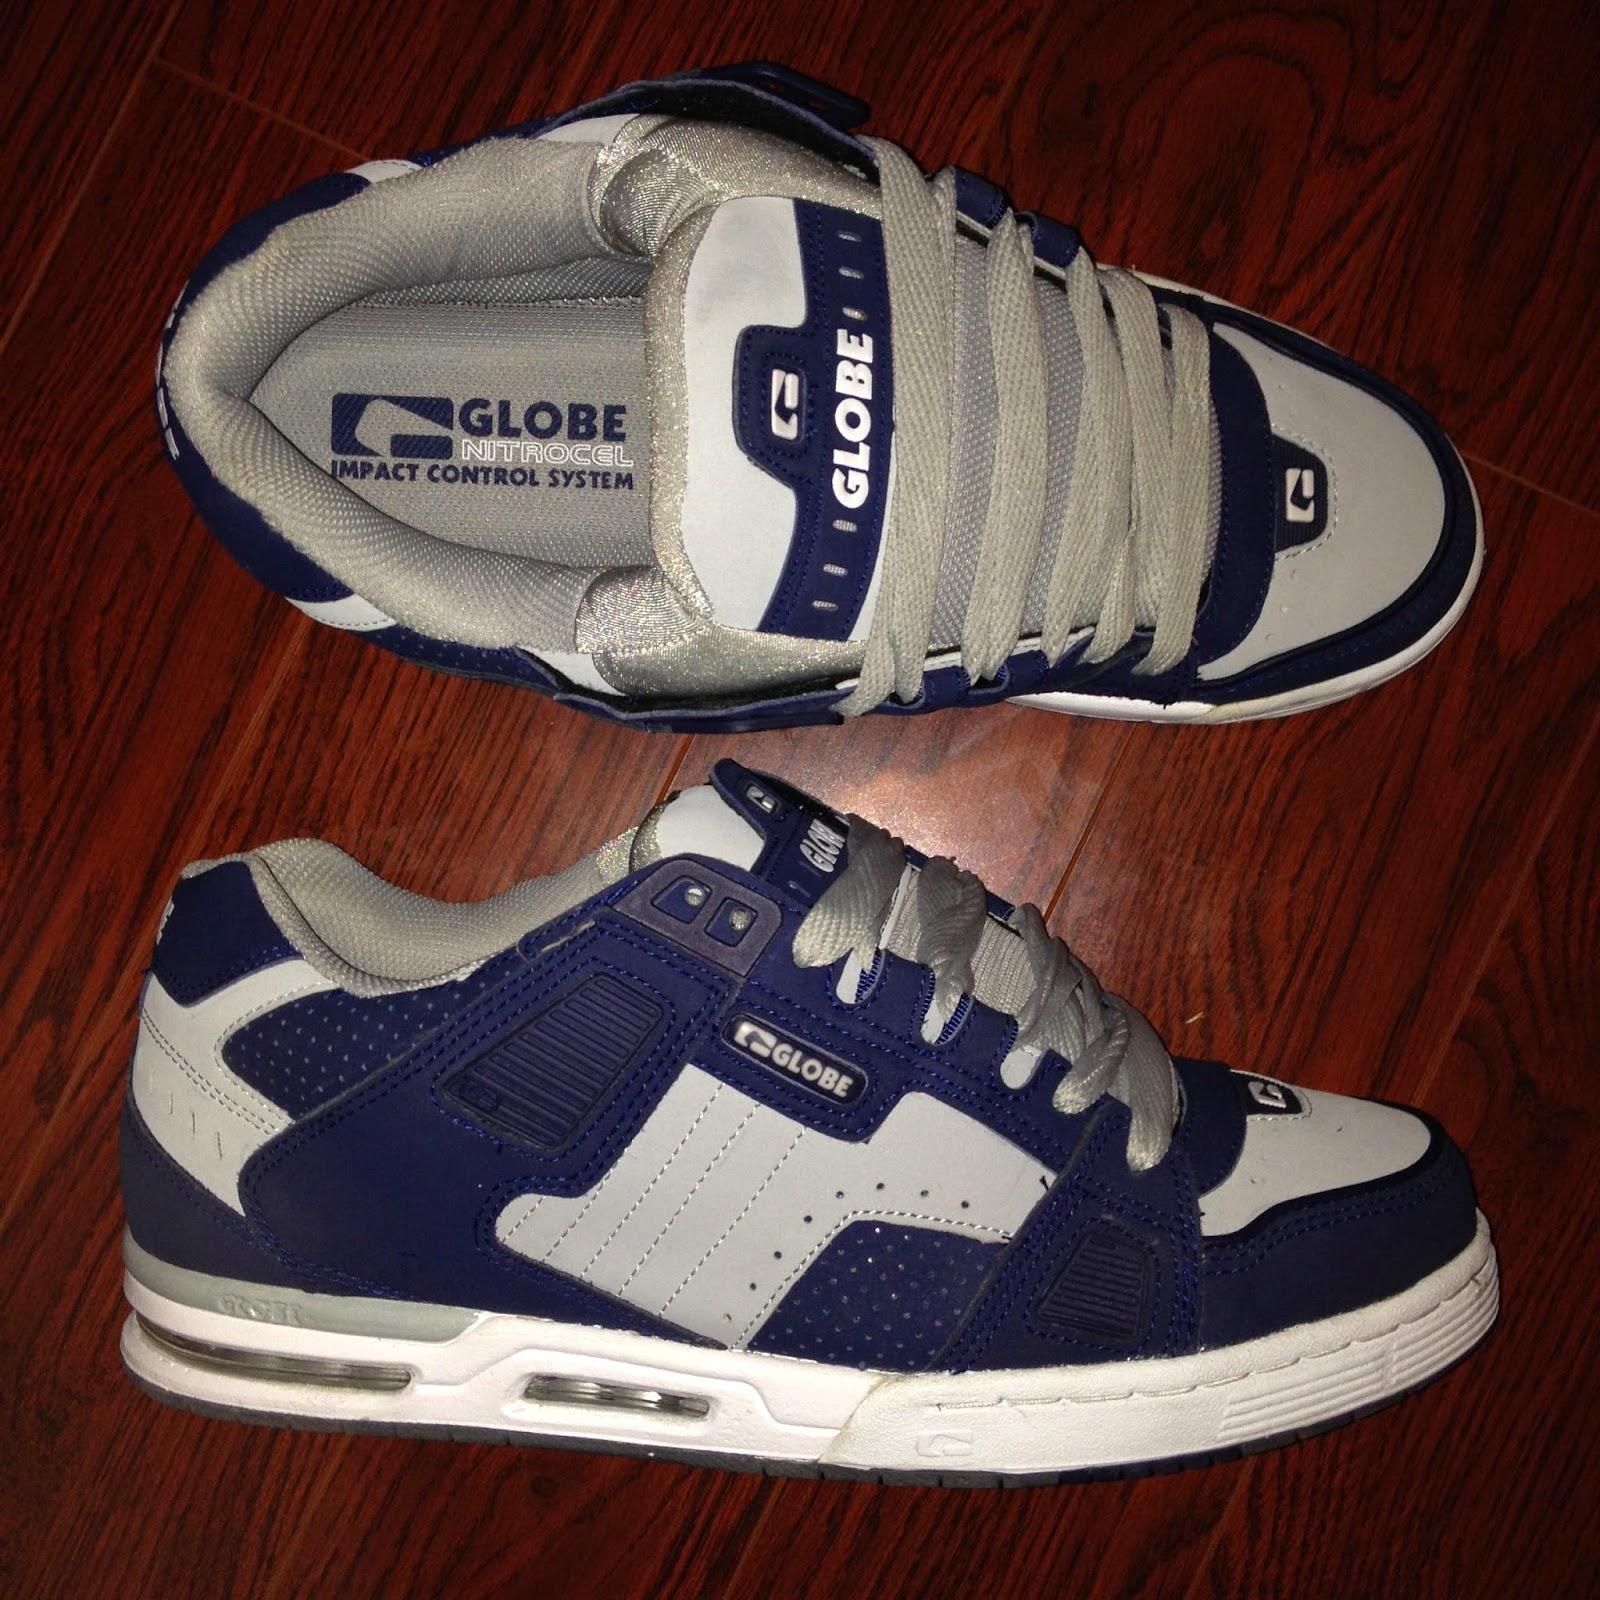 virgil s globe shoes x sabre